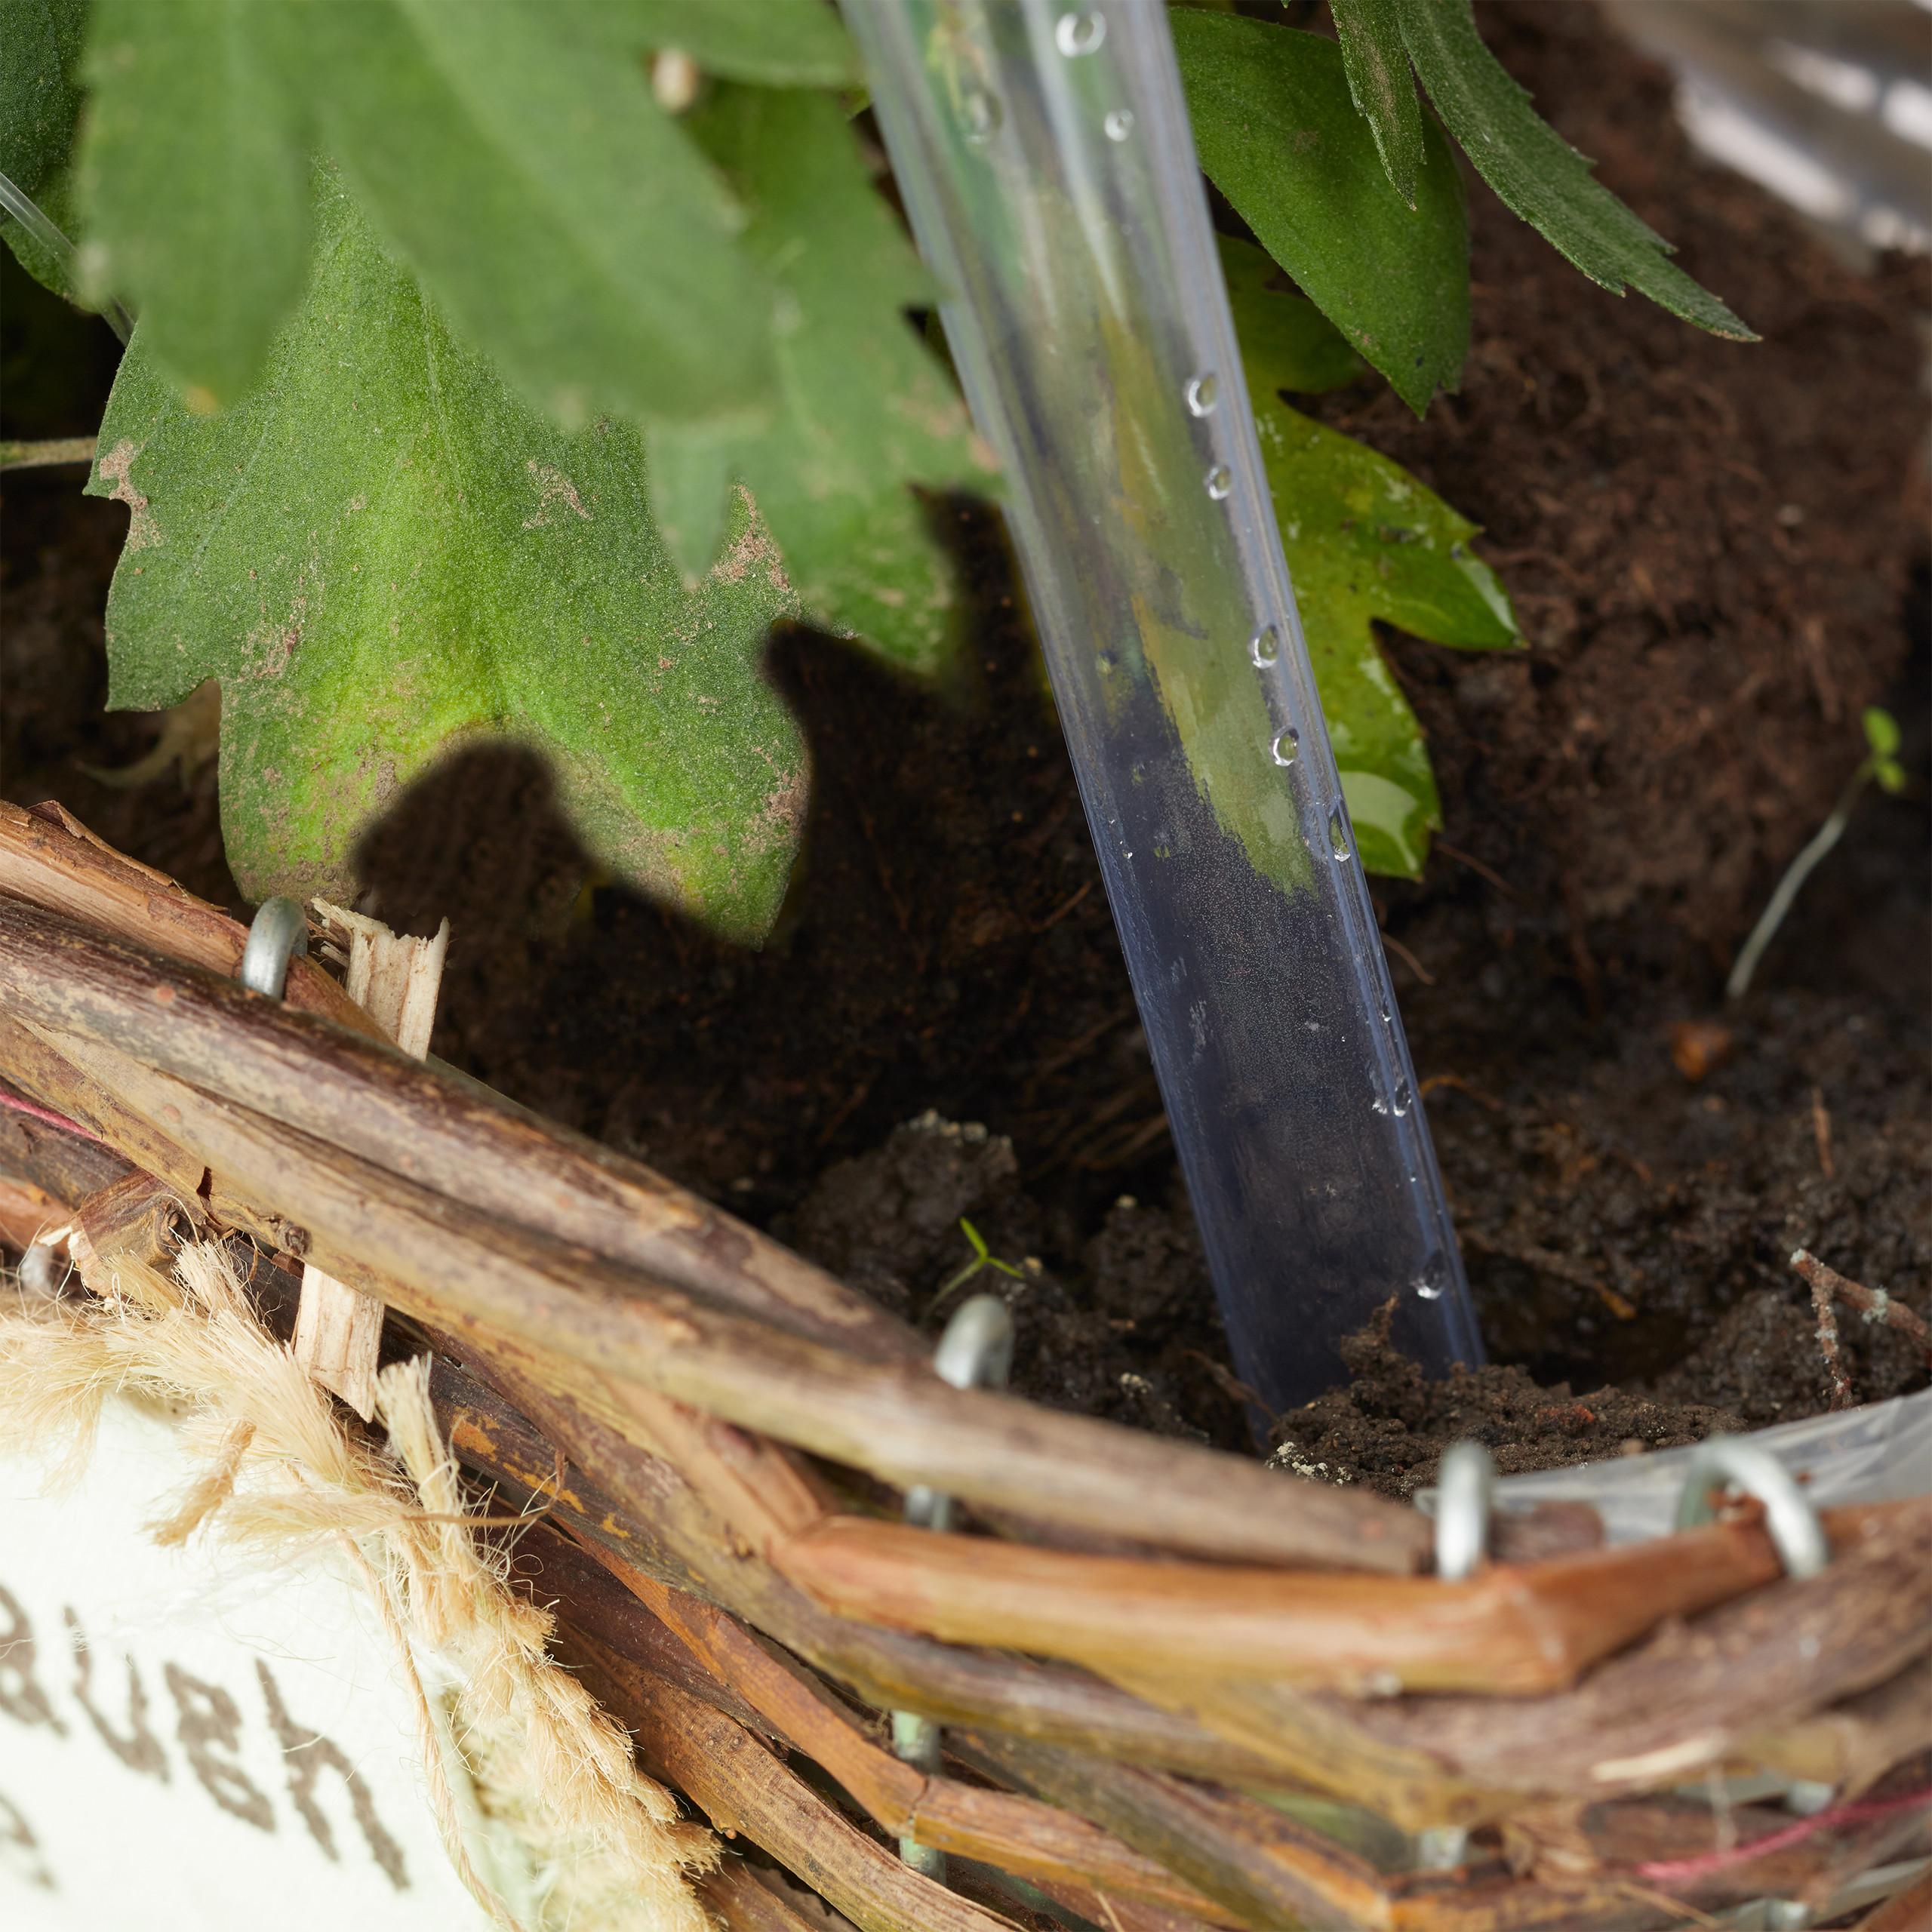 12x Bewässerungskugeln transparent Bewässerungshilfen Pflanzensitter Durstkugeln